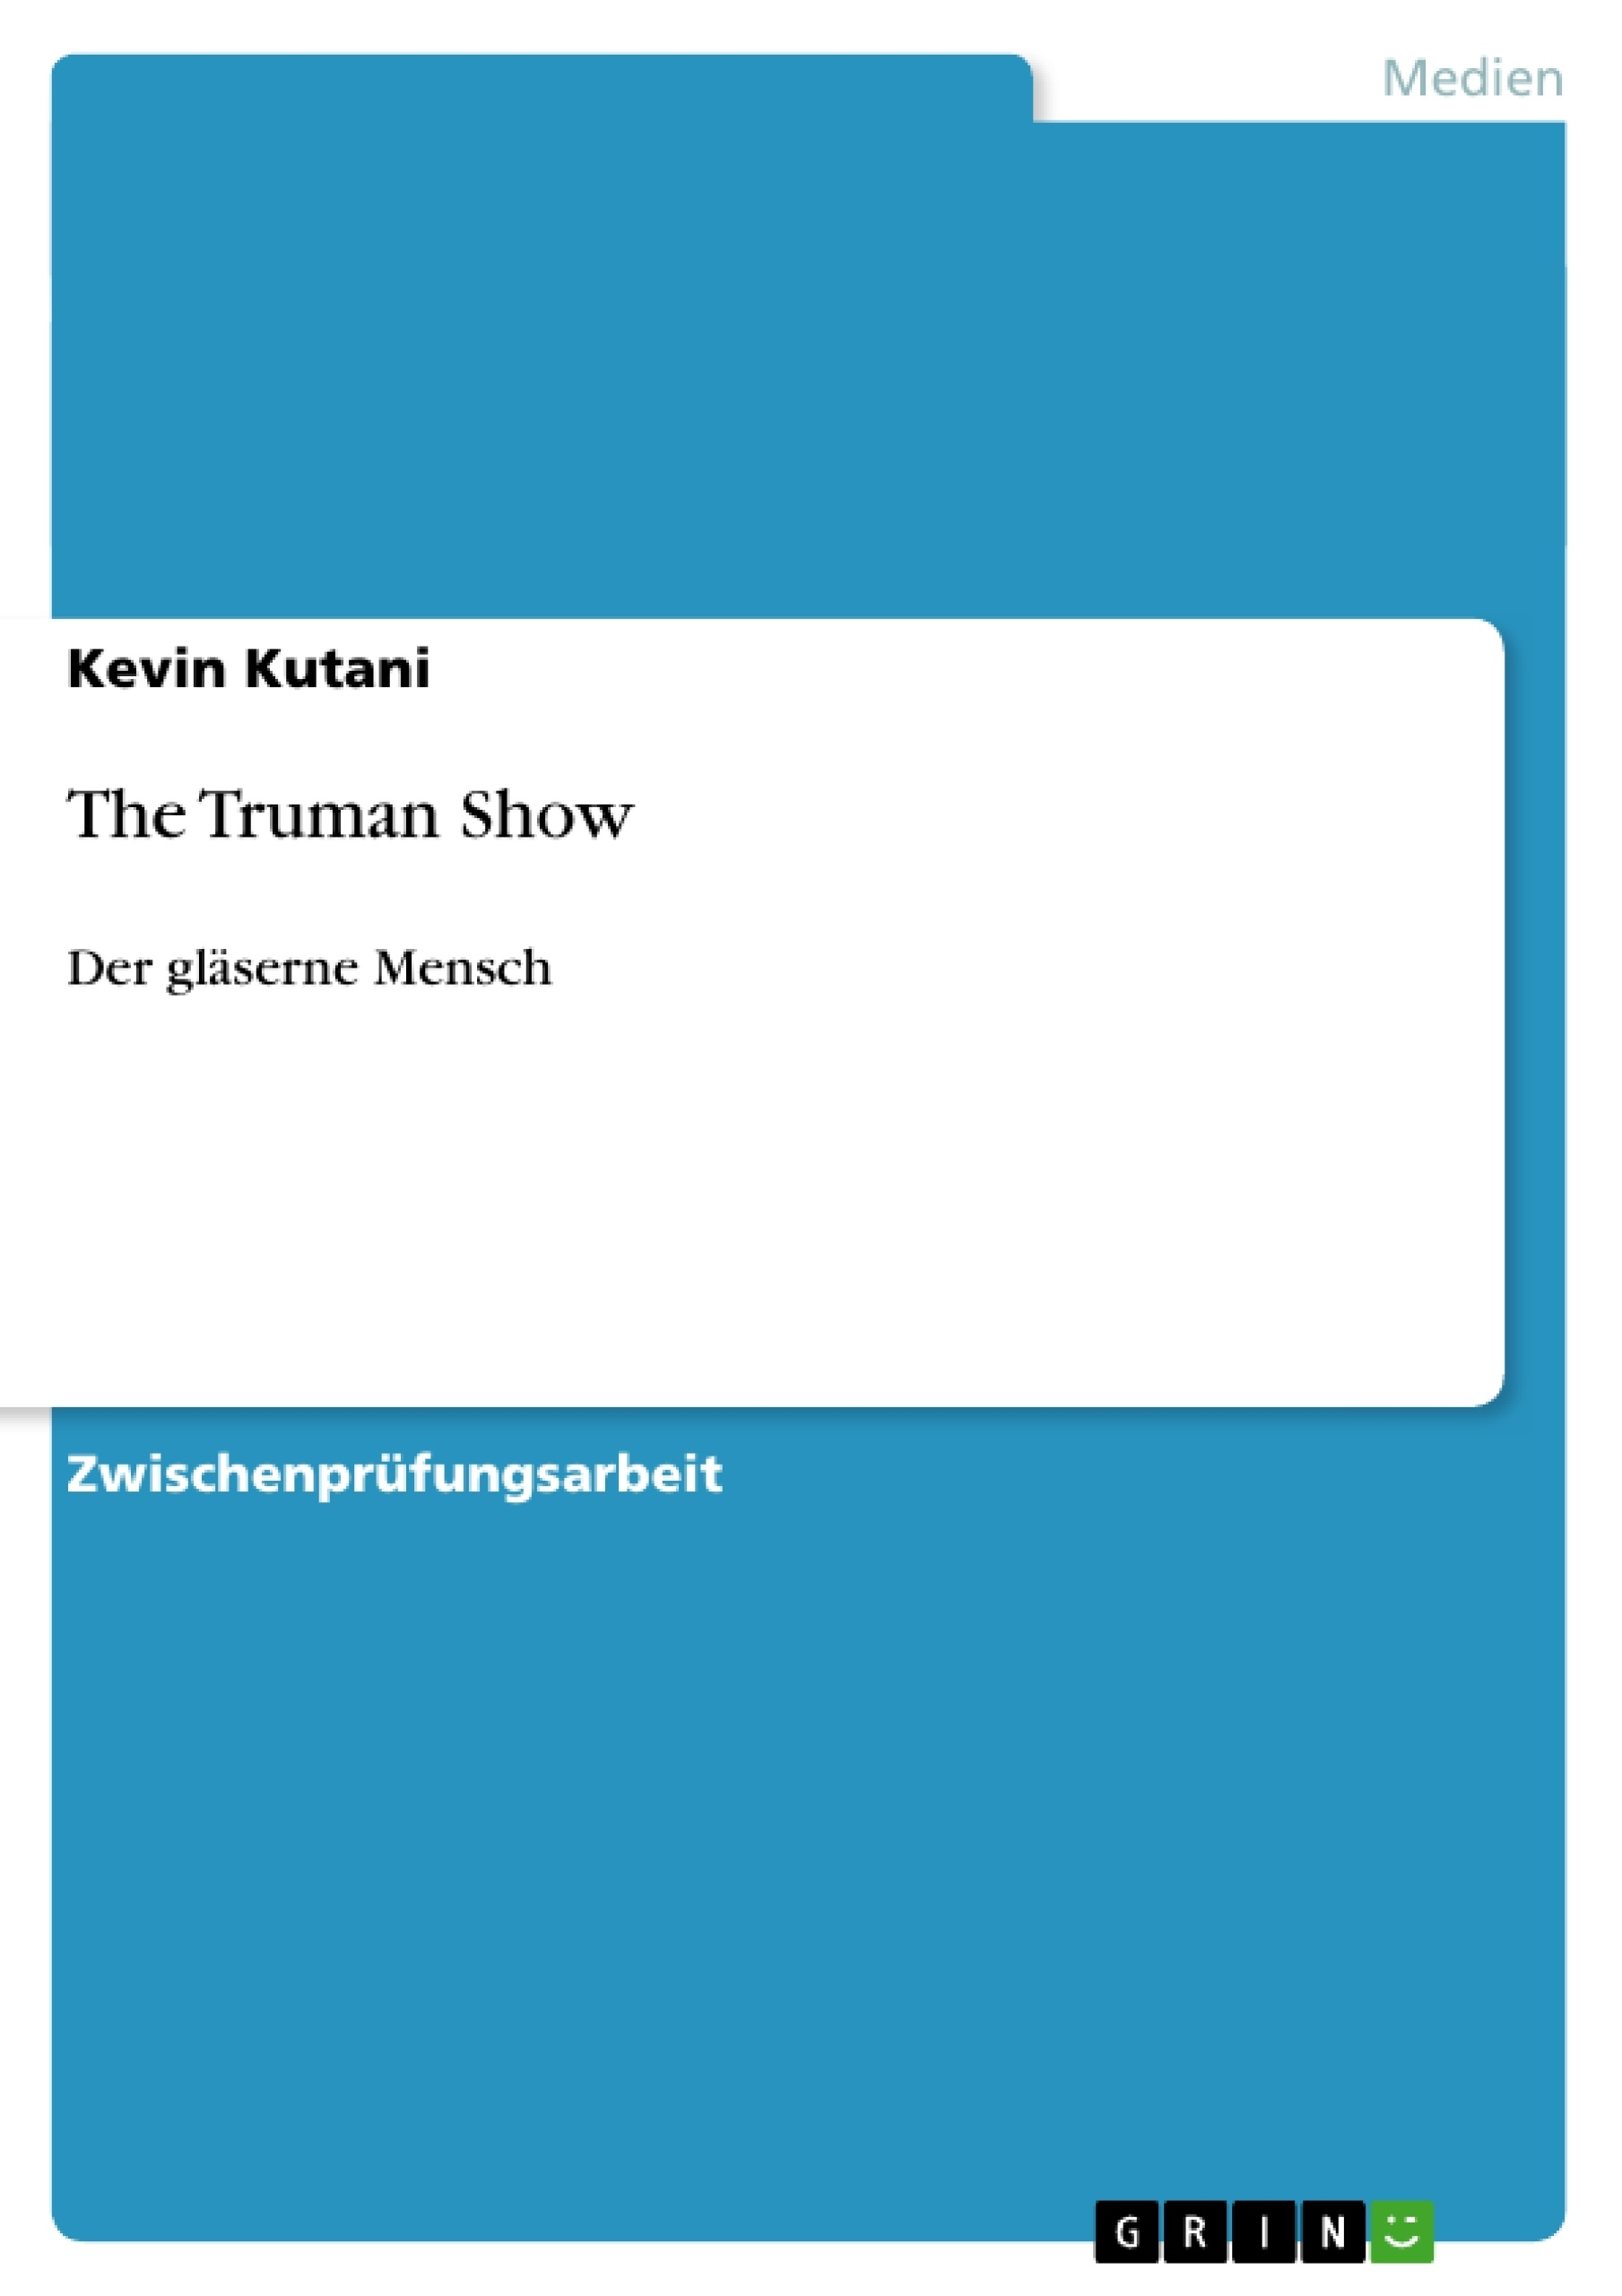 Titel: The Truman Show